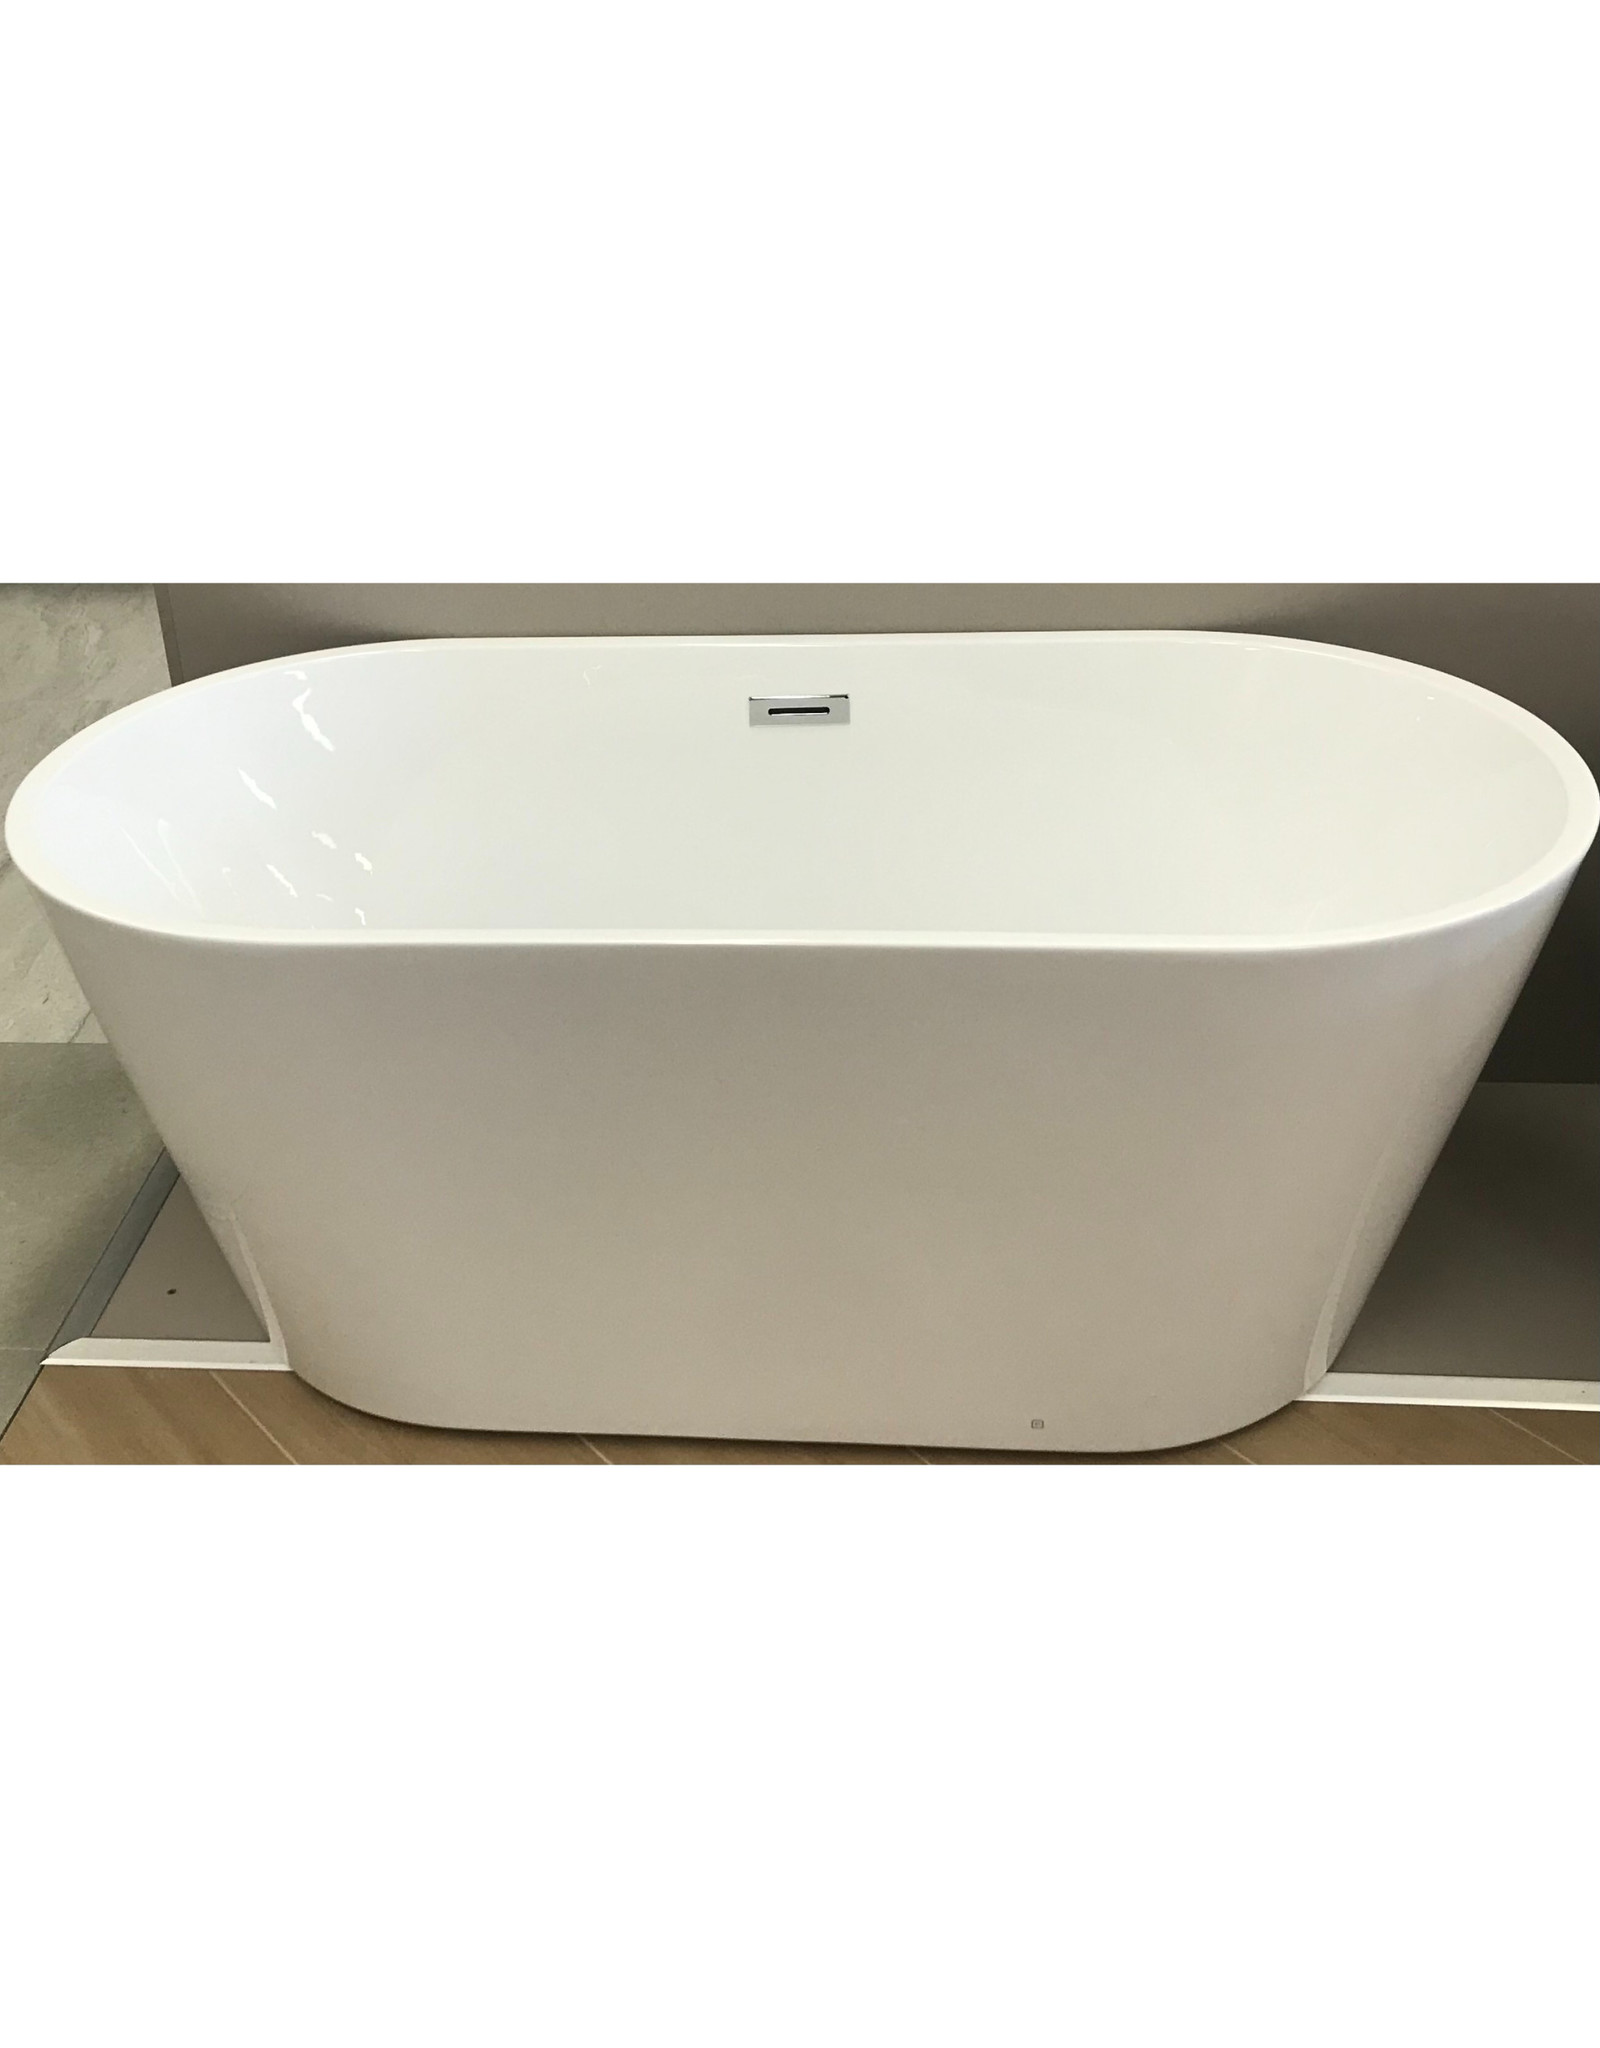 CLEARANCE CENTRE CLEARANCE - 1500mm, Voghera Bathtub